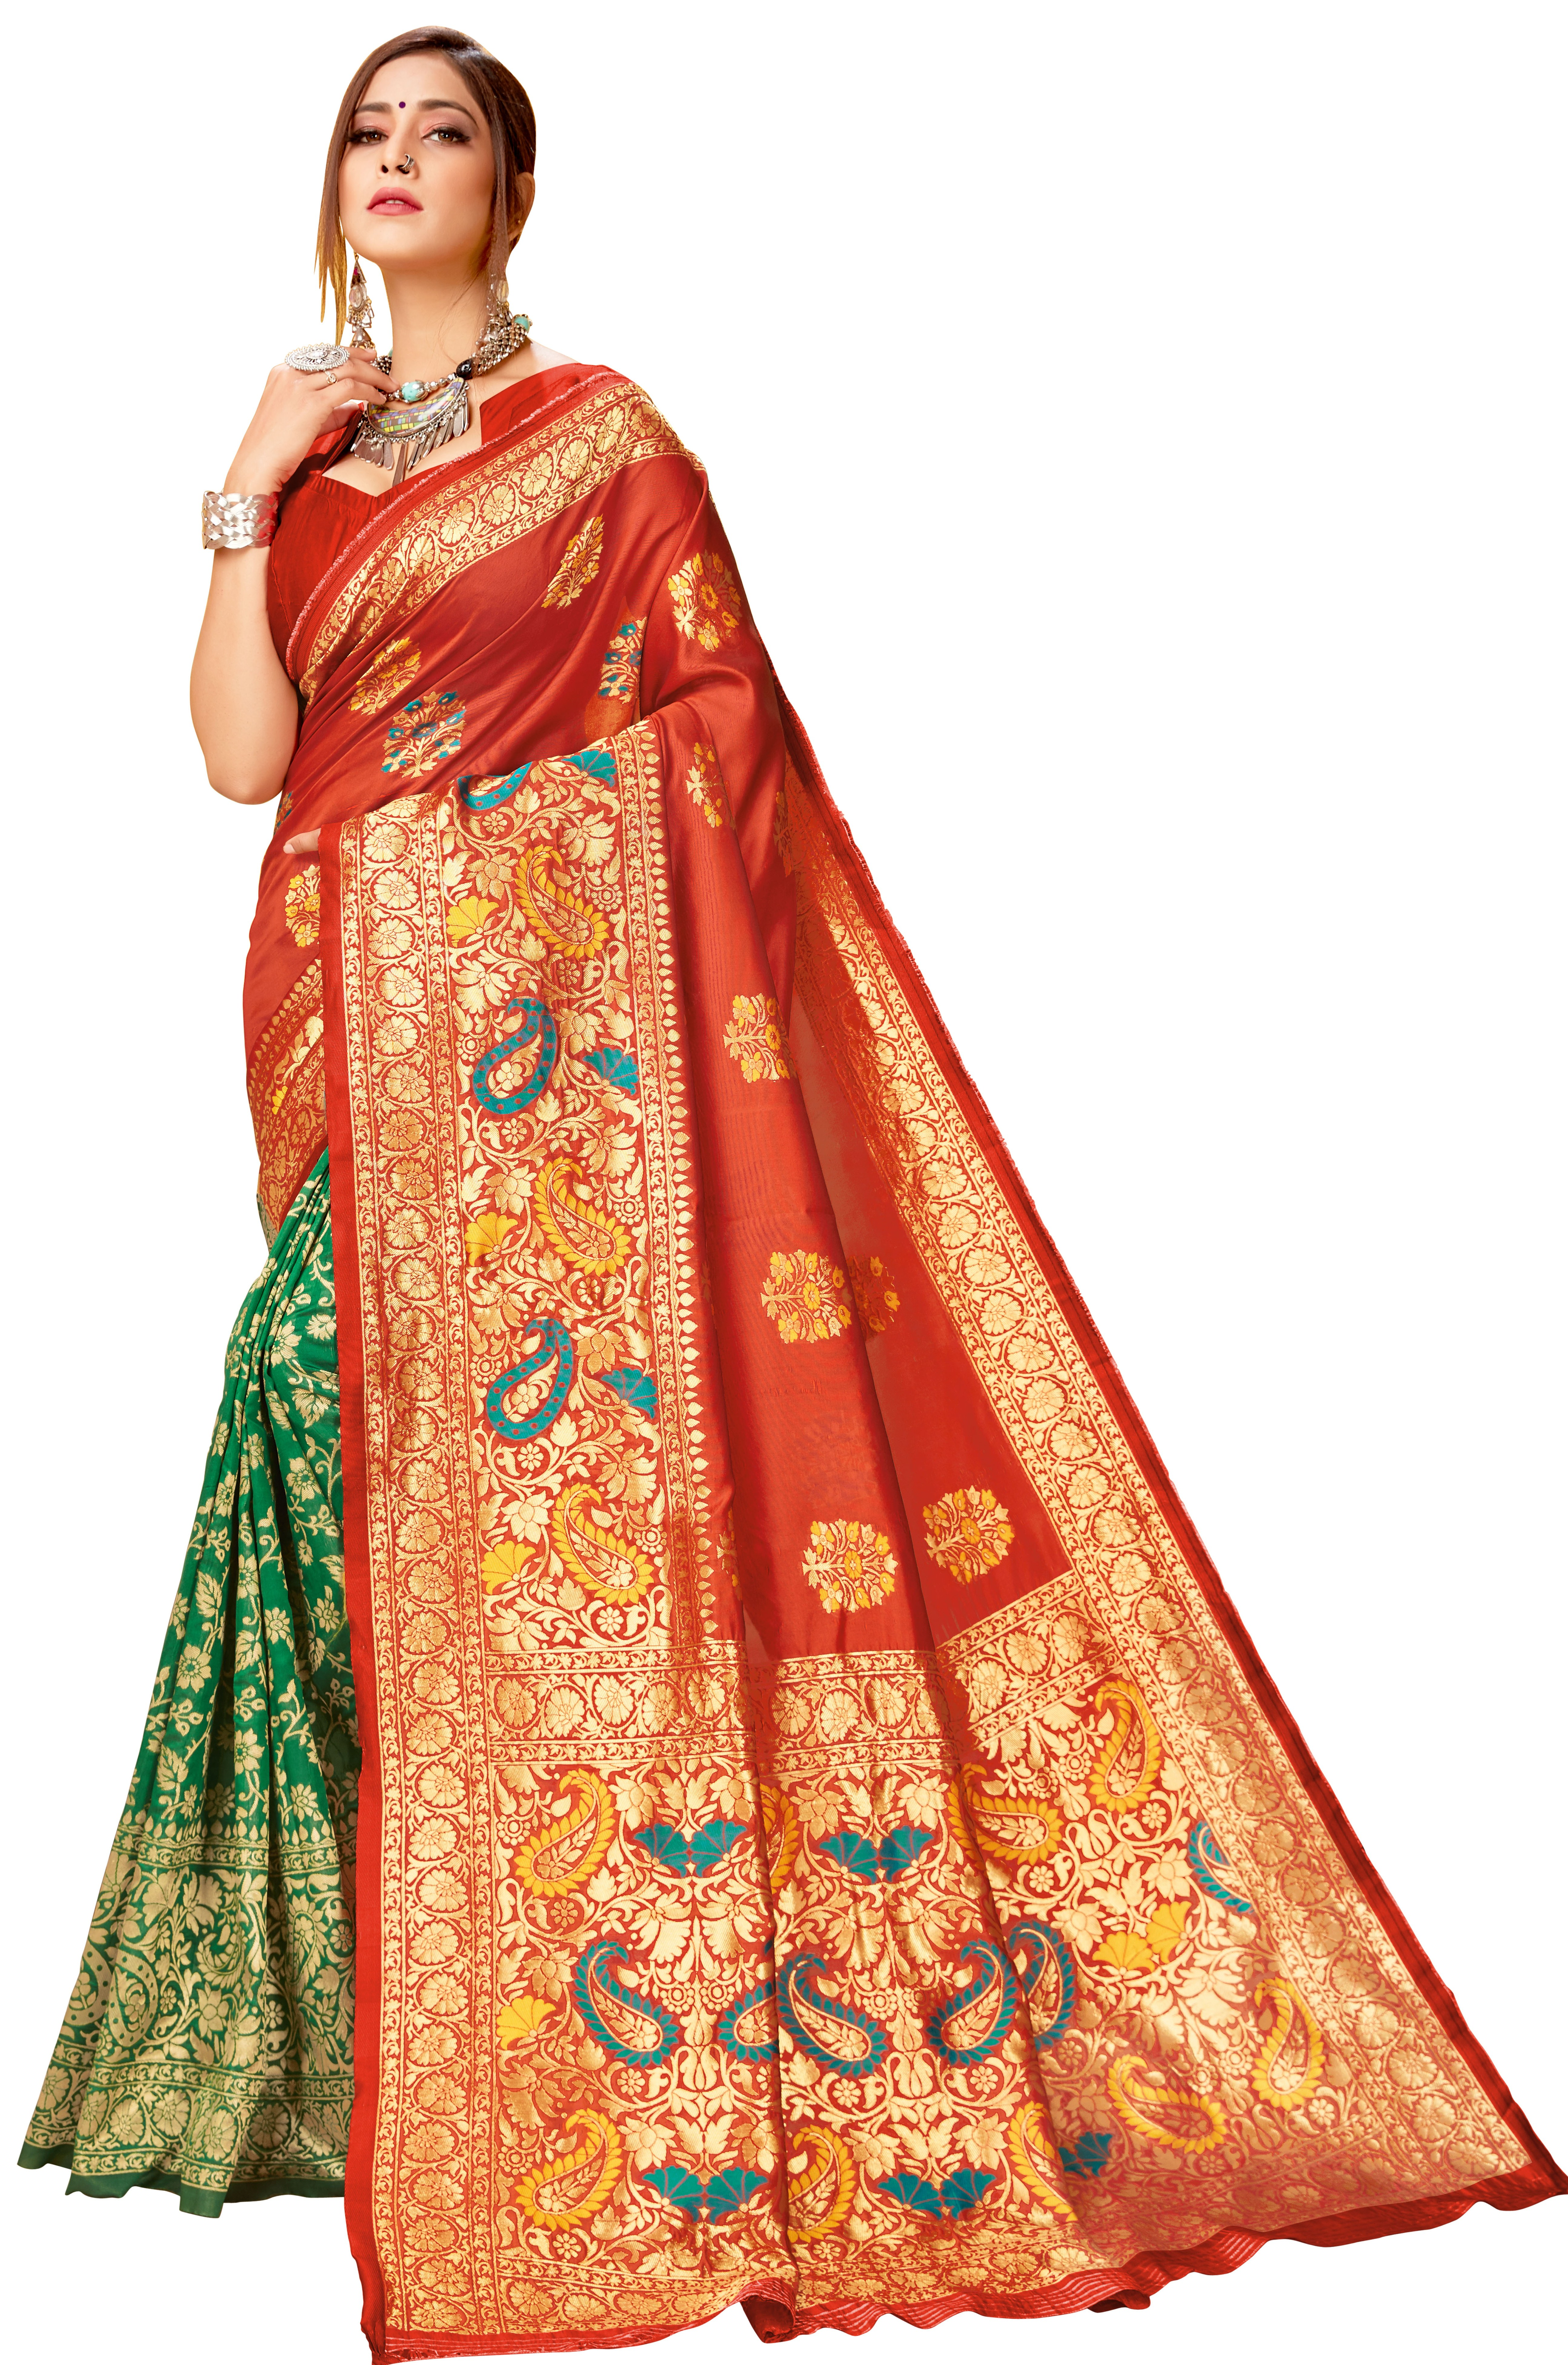 Glemora | Glemora Red & Green Lichi Cotton Virasat Saree With Unstitched Blouse